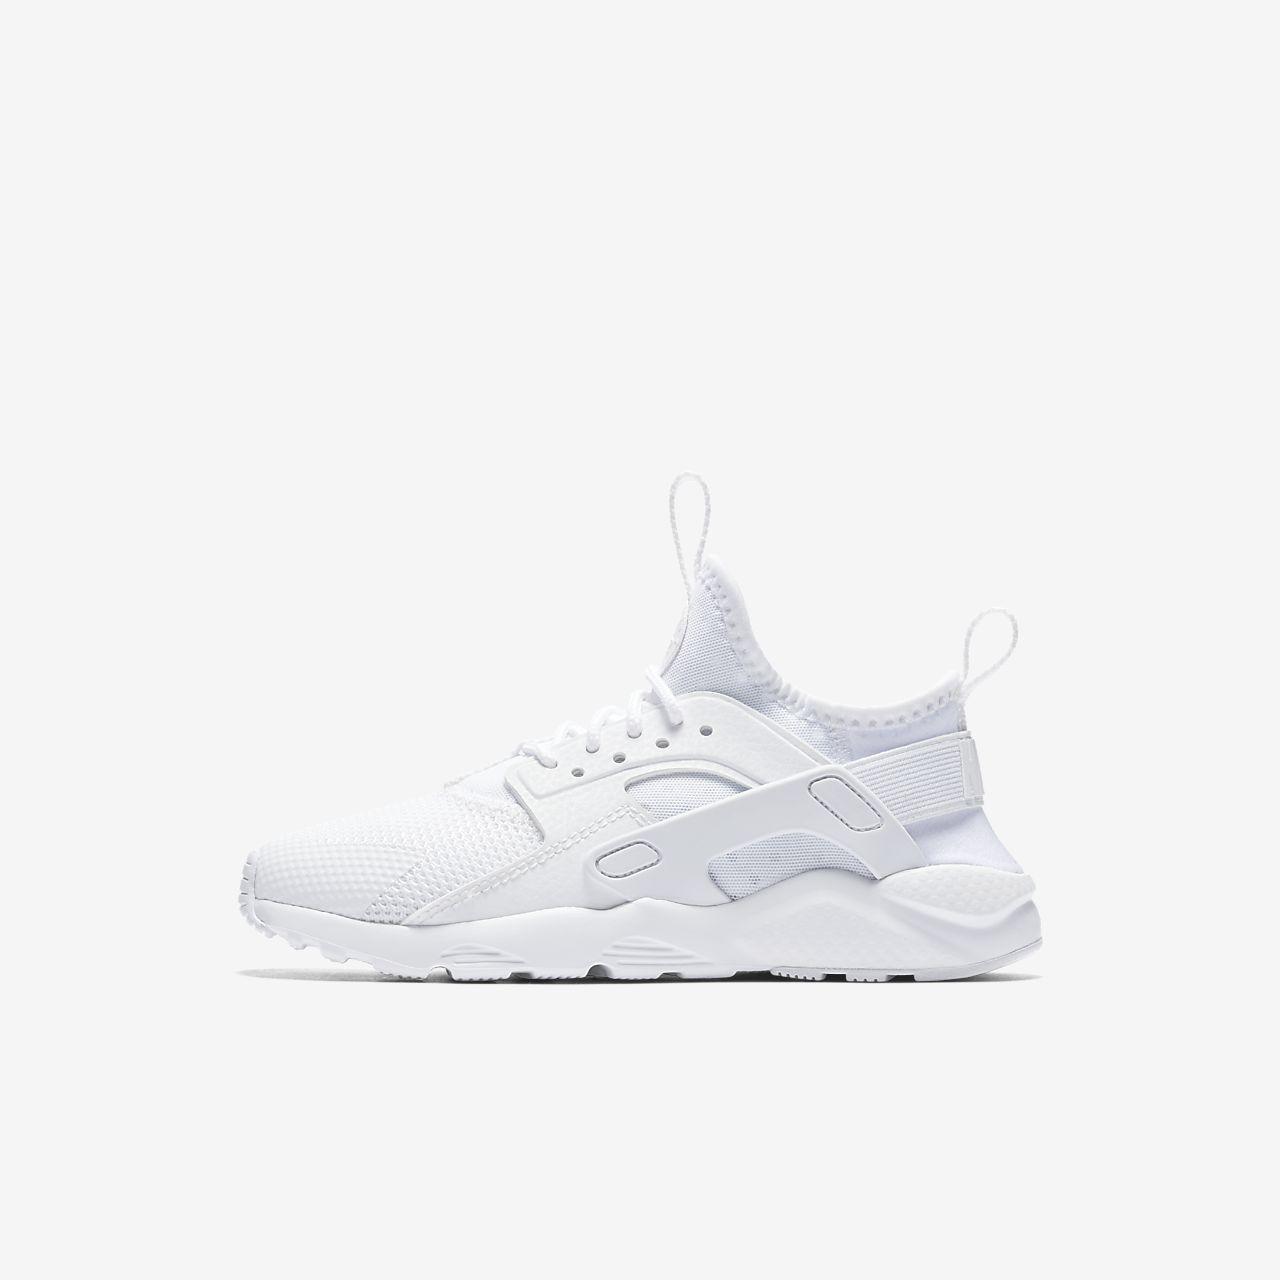 3d49f92a4c0 Calzado para niños talla pequeña Nike Huarache Ultra. Nike.com CL